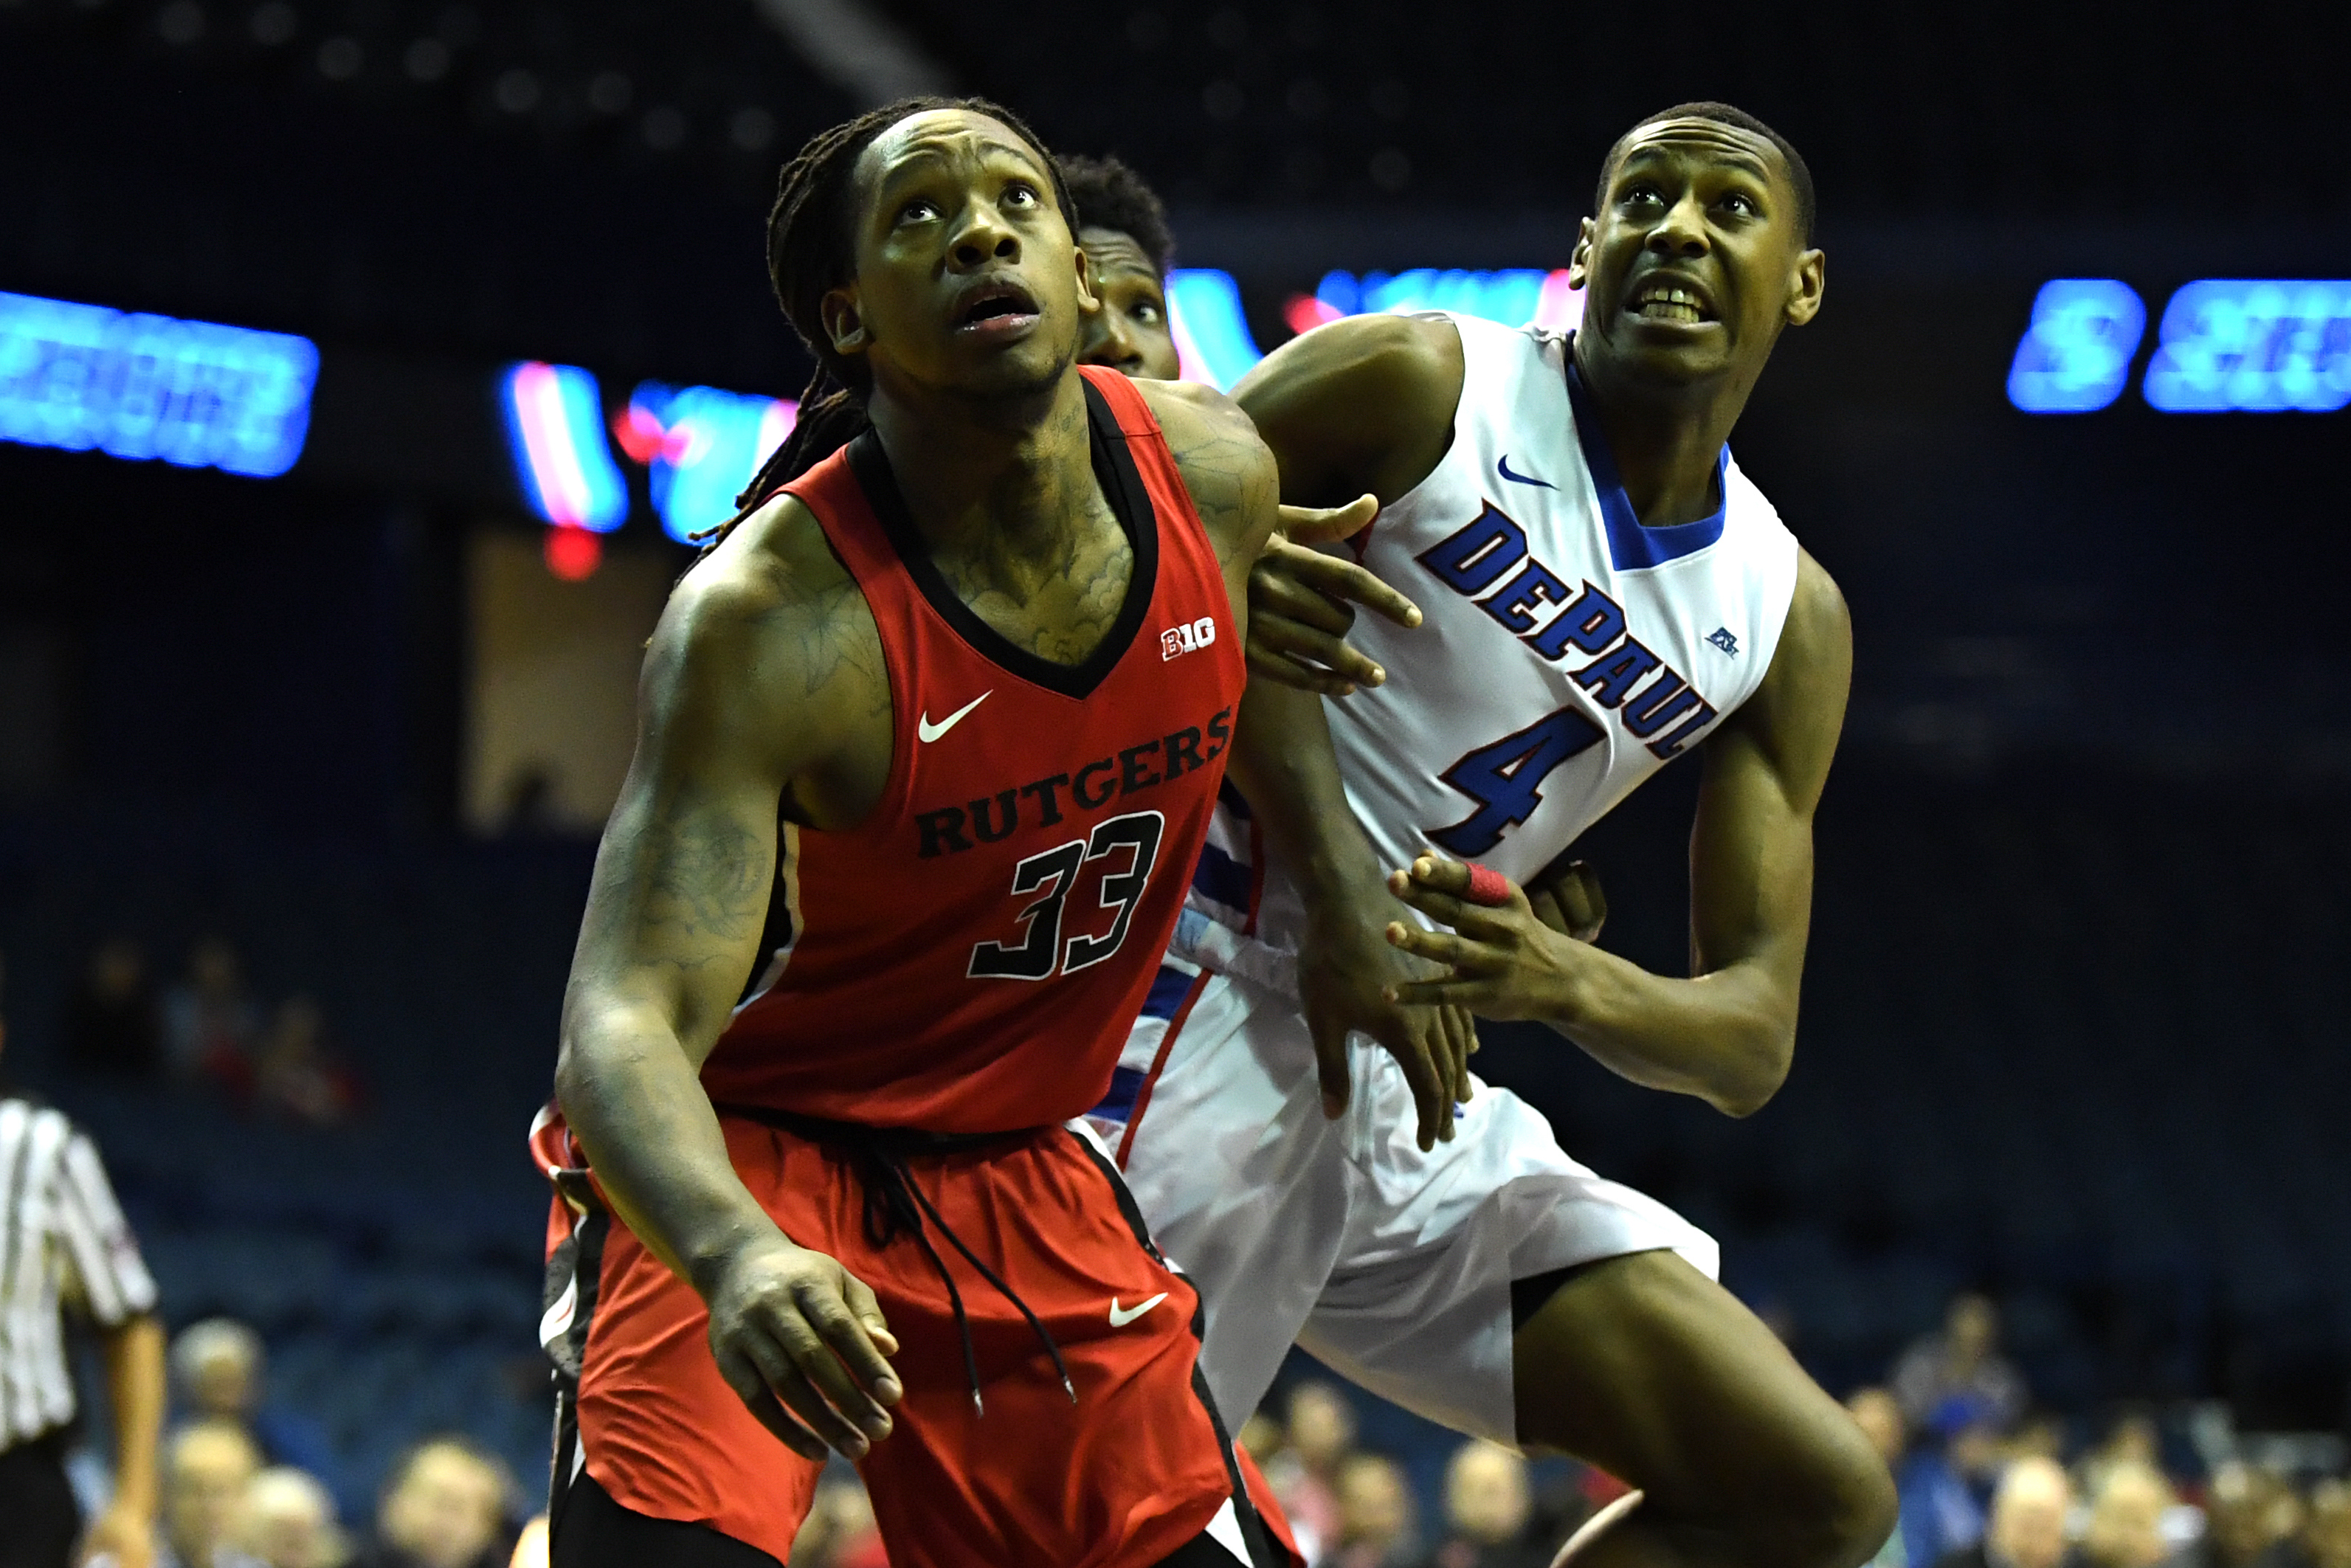 NCAA BASKETBALL: NOV 17 Rutgers at DePaul